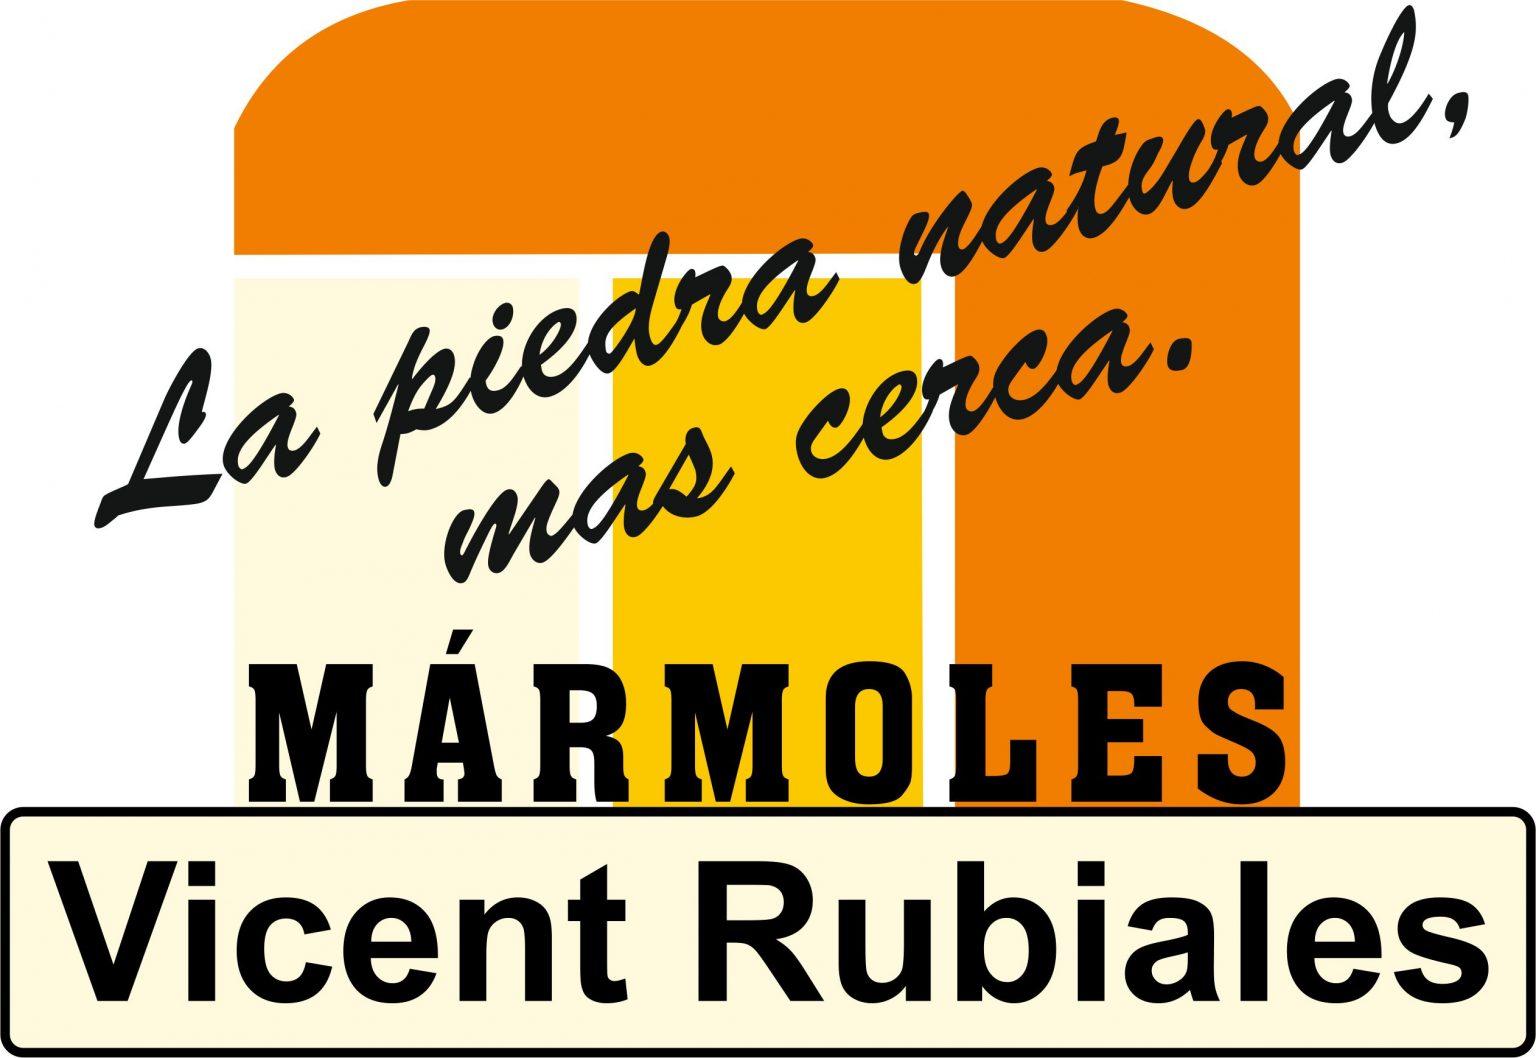 Mármoles Vicent Rubiales